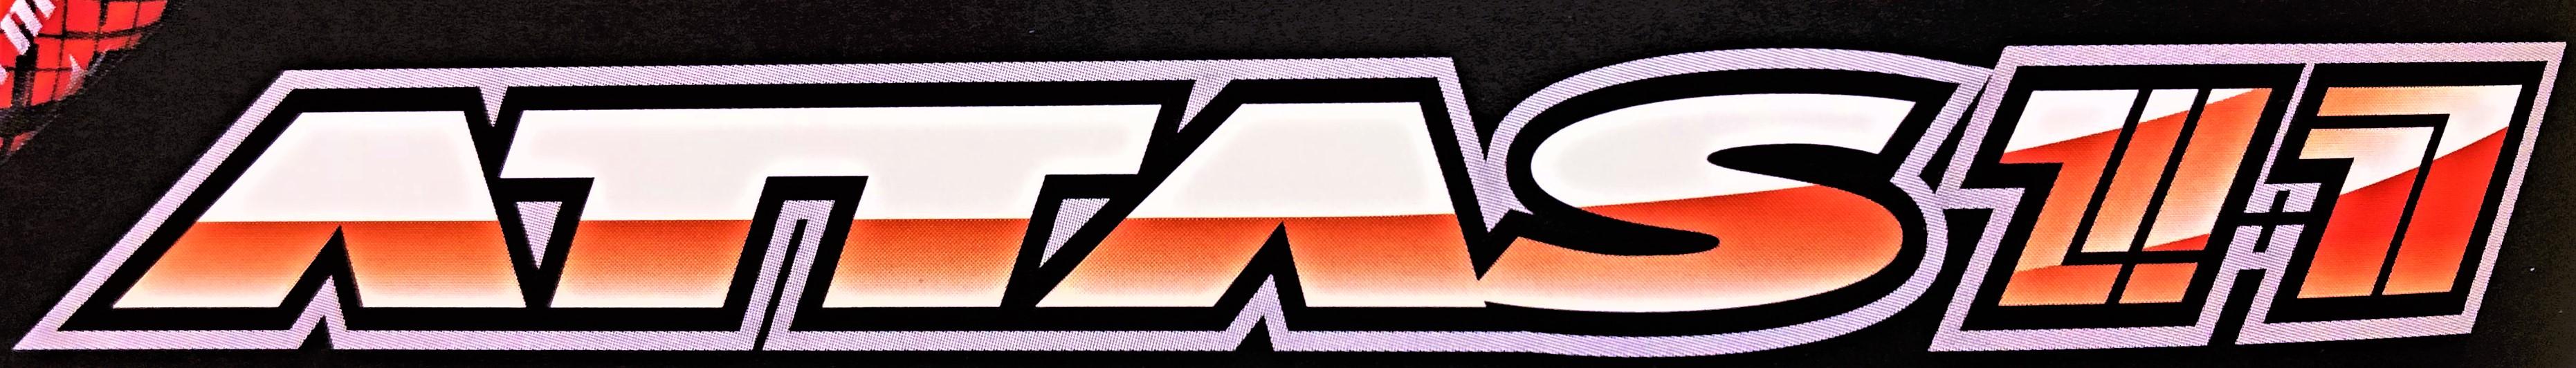 ATTAS11のロゴマーク